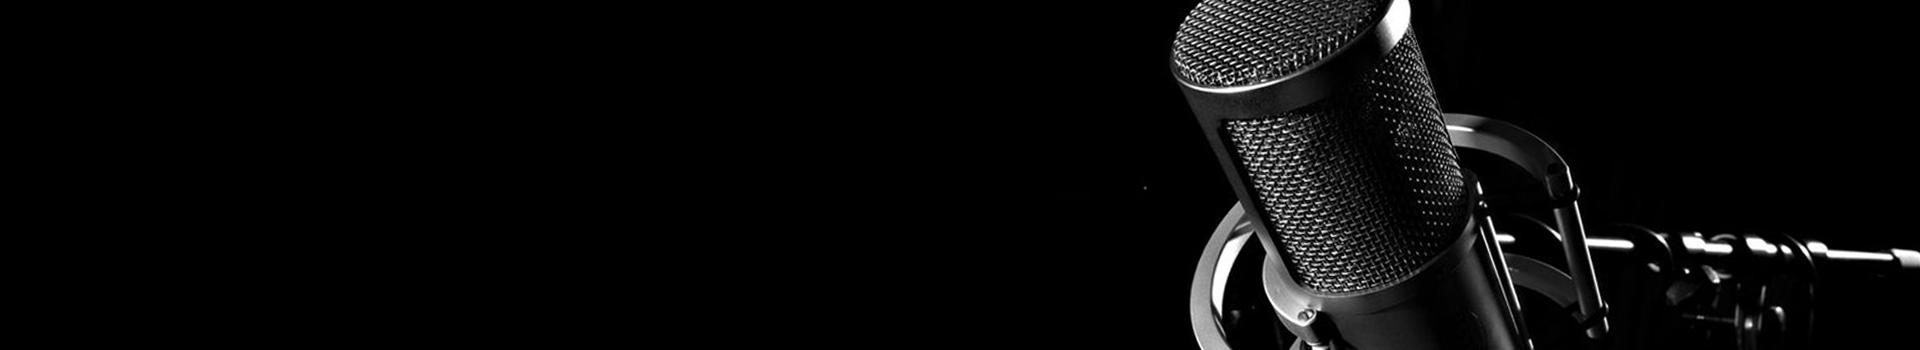 banner_mic_pop